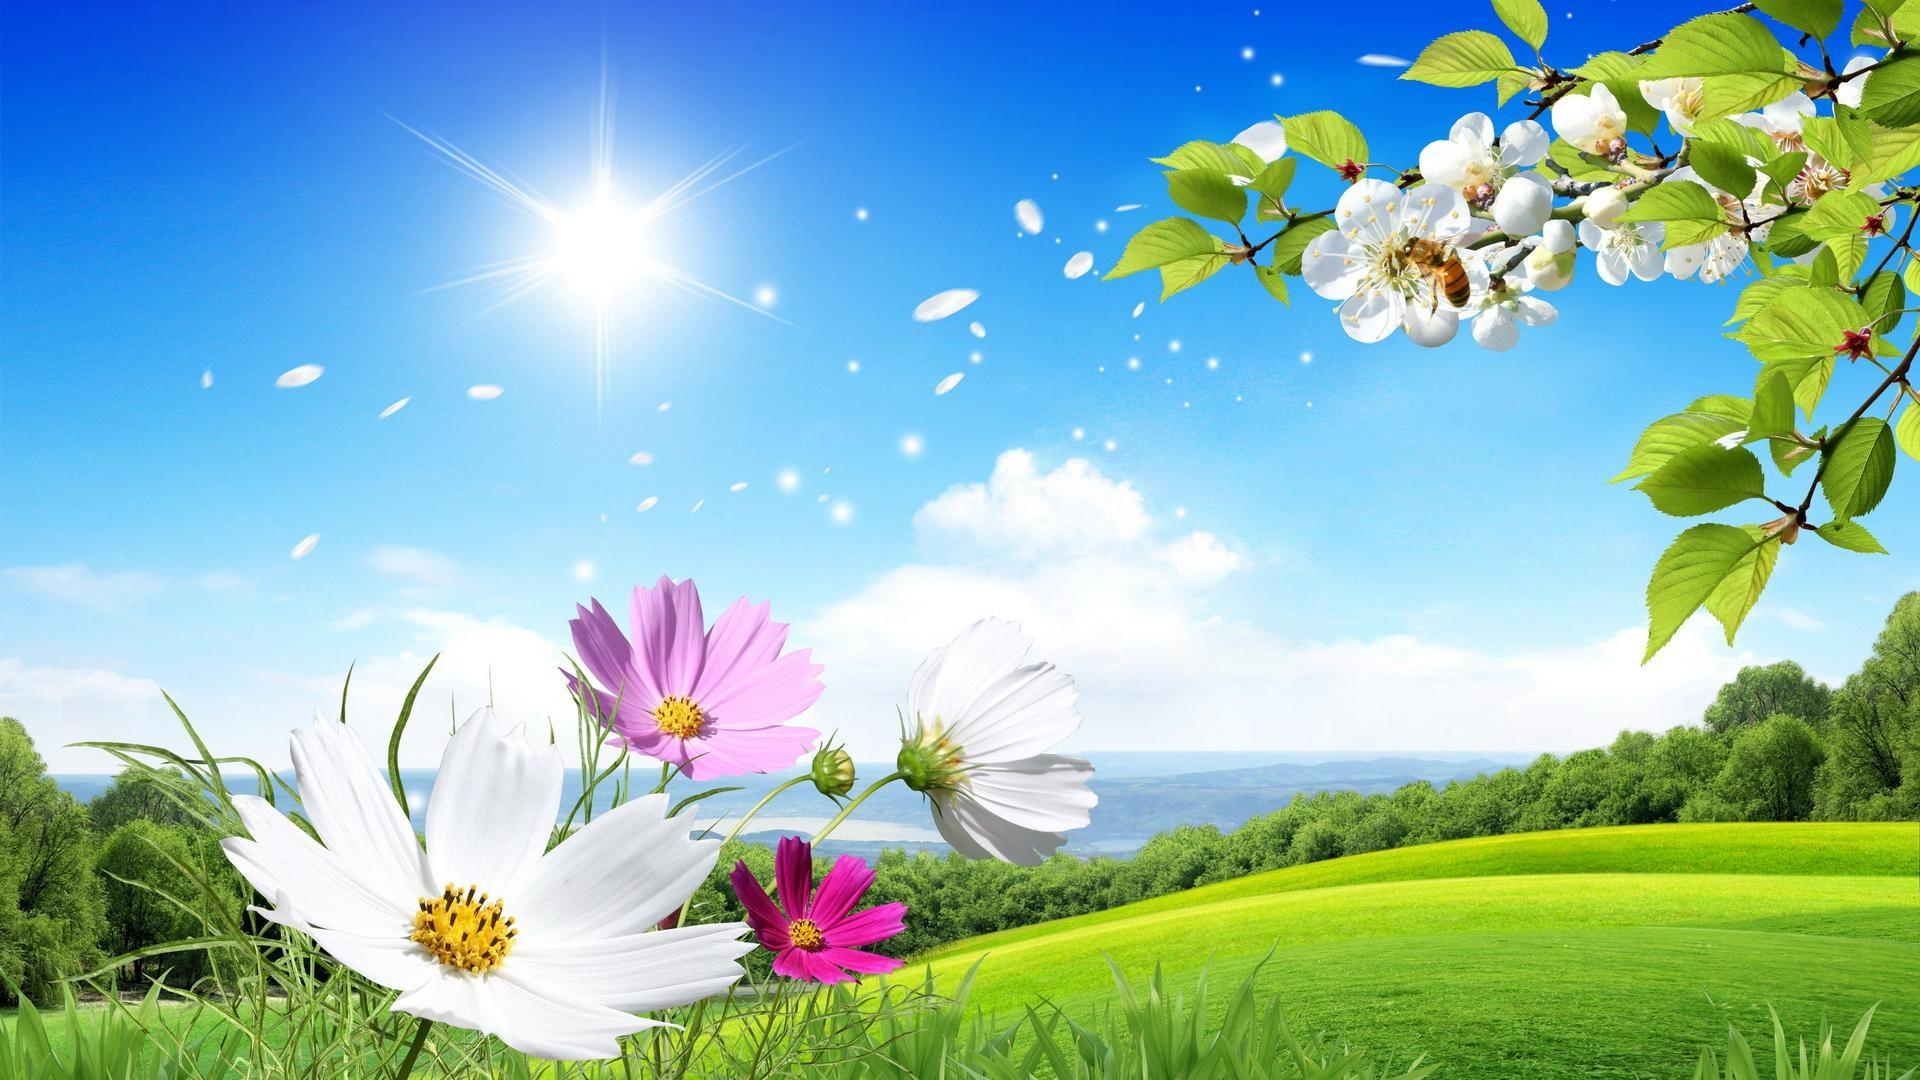 … desktop beautiful summer images widescreen …